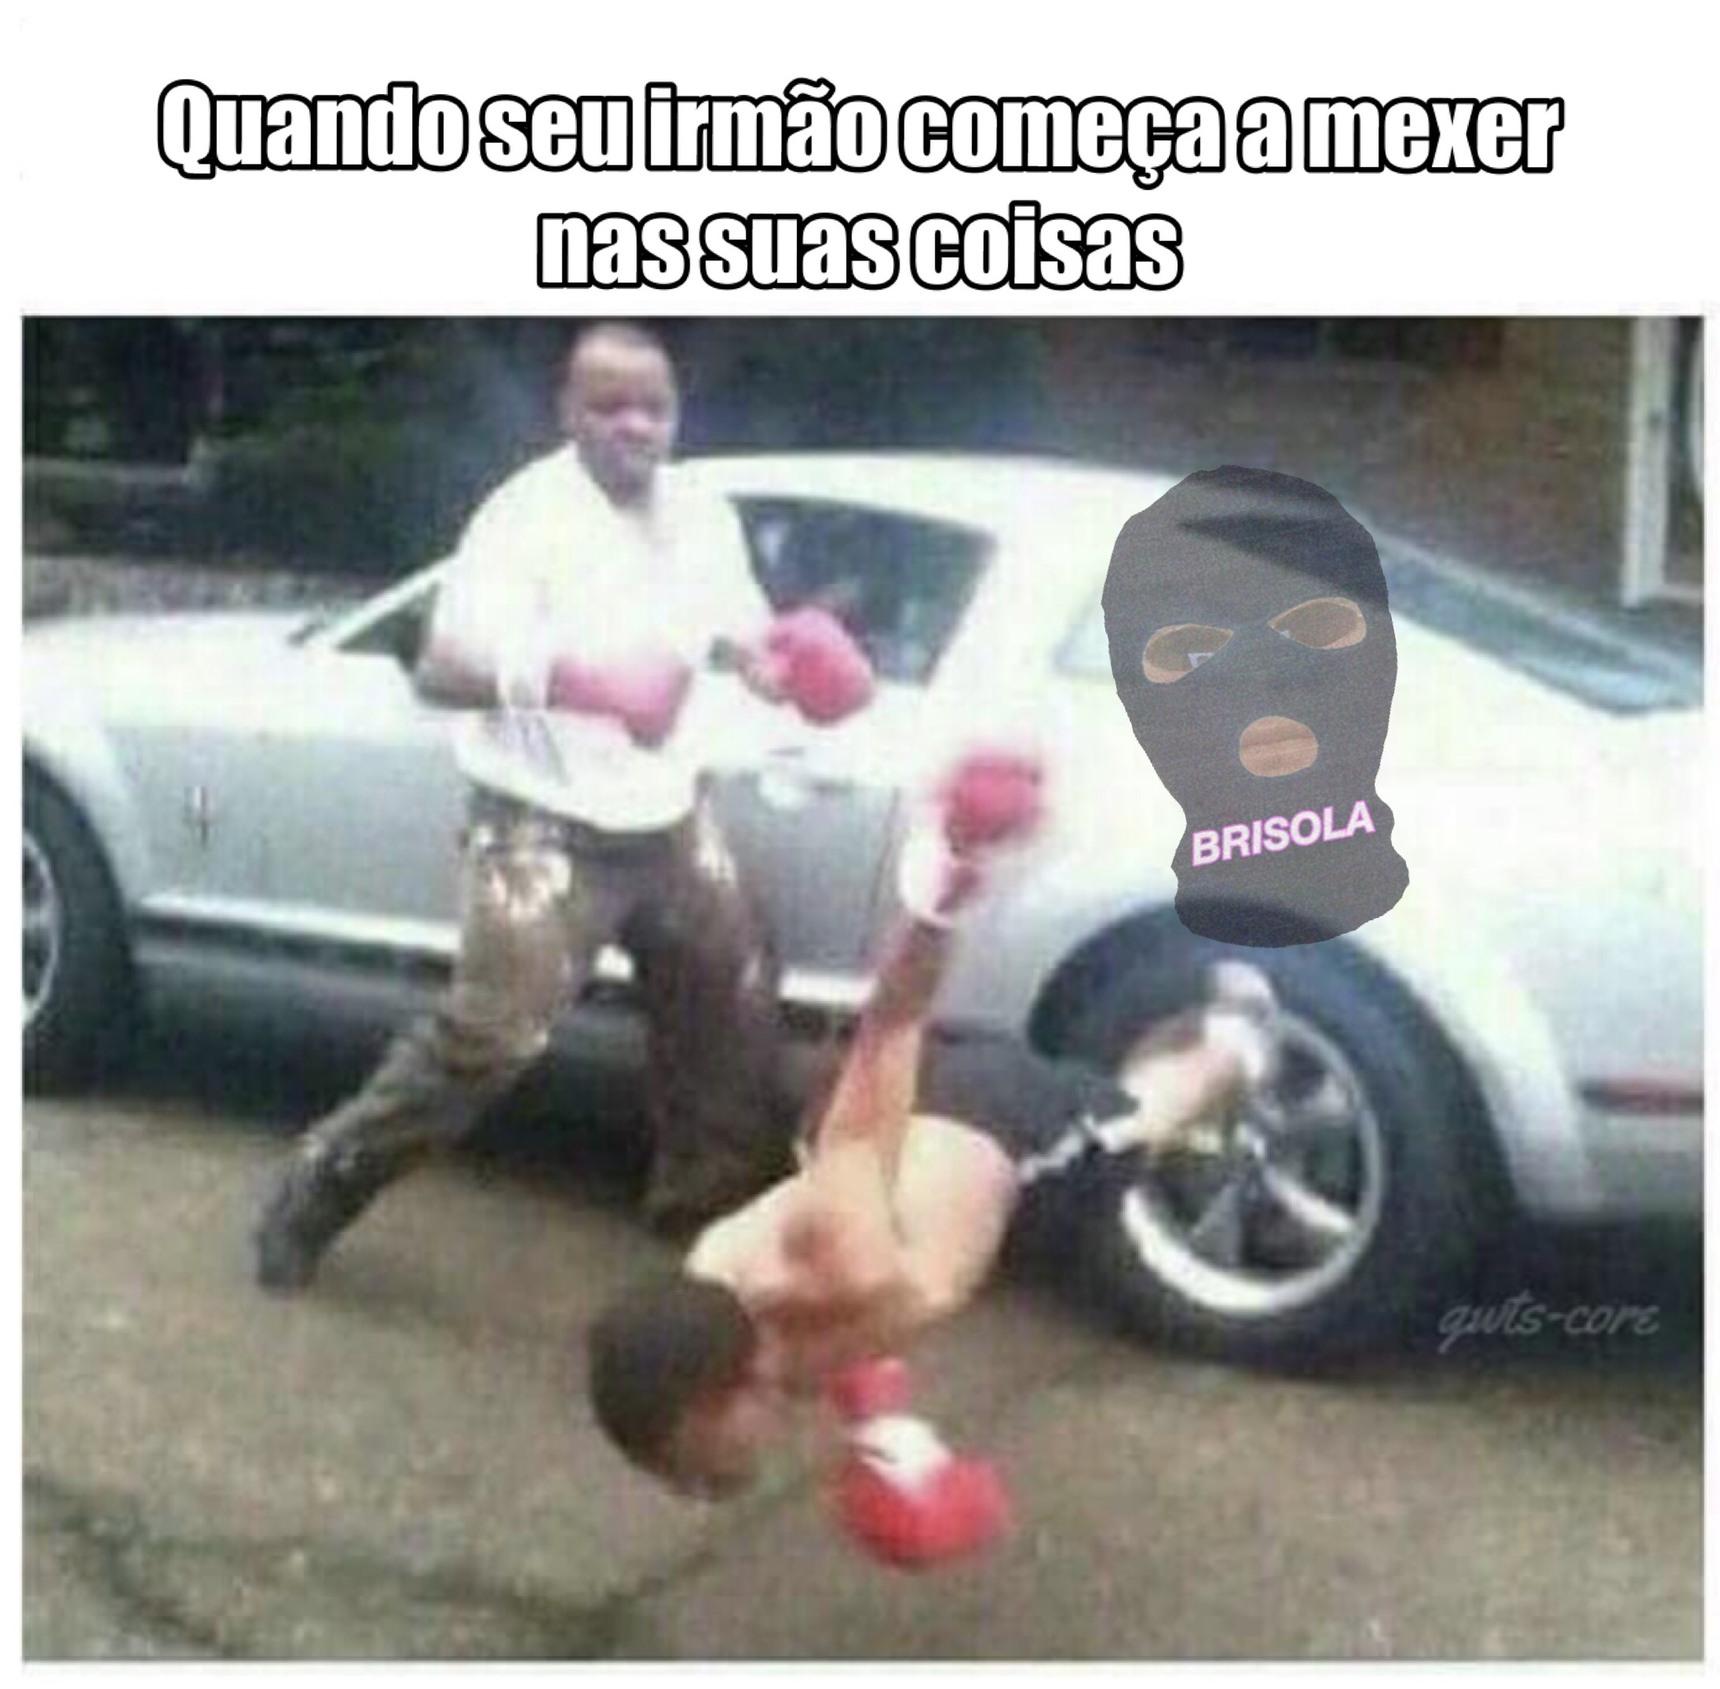 NAO MEXE ARROMBADO - meme